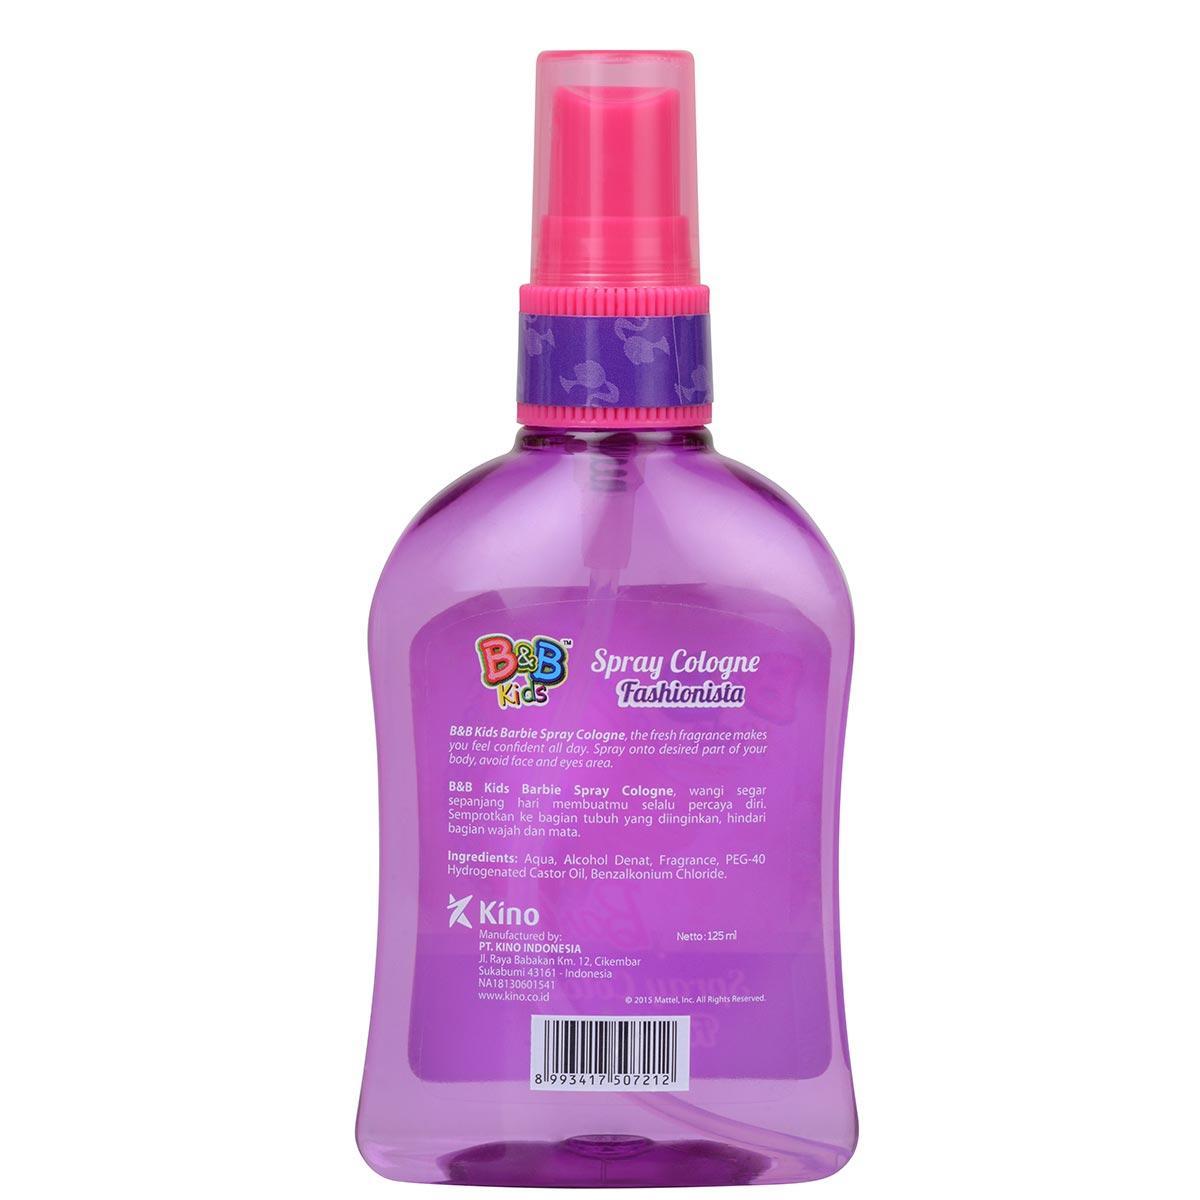 Fitur Bb Kids Barbie Spray Cologne Fashionista Botol 125 Ml Dan Minum New B Dengan 600ml 2